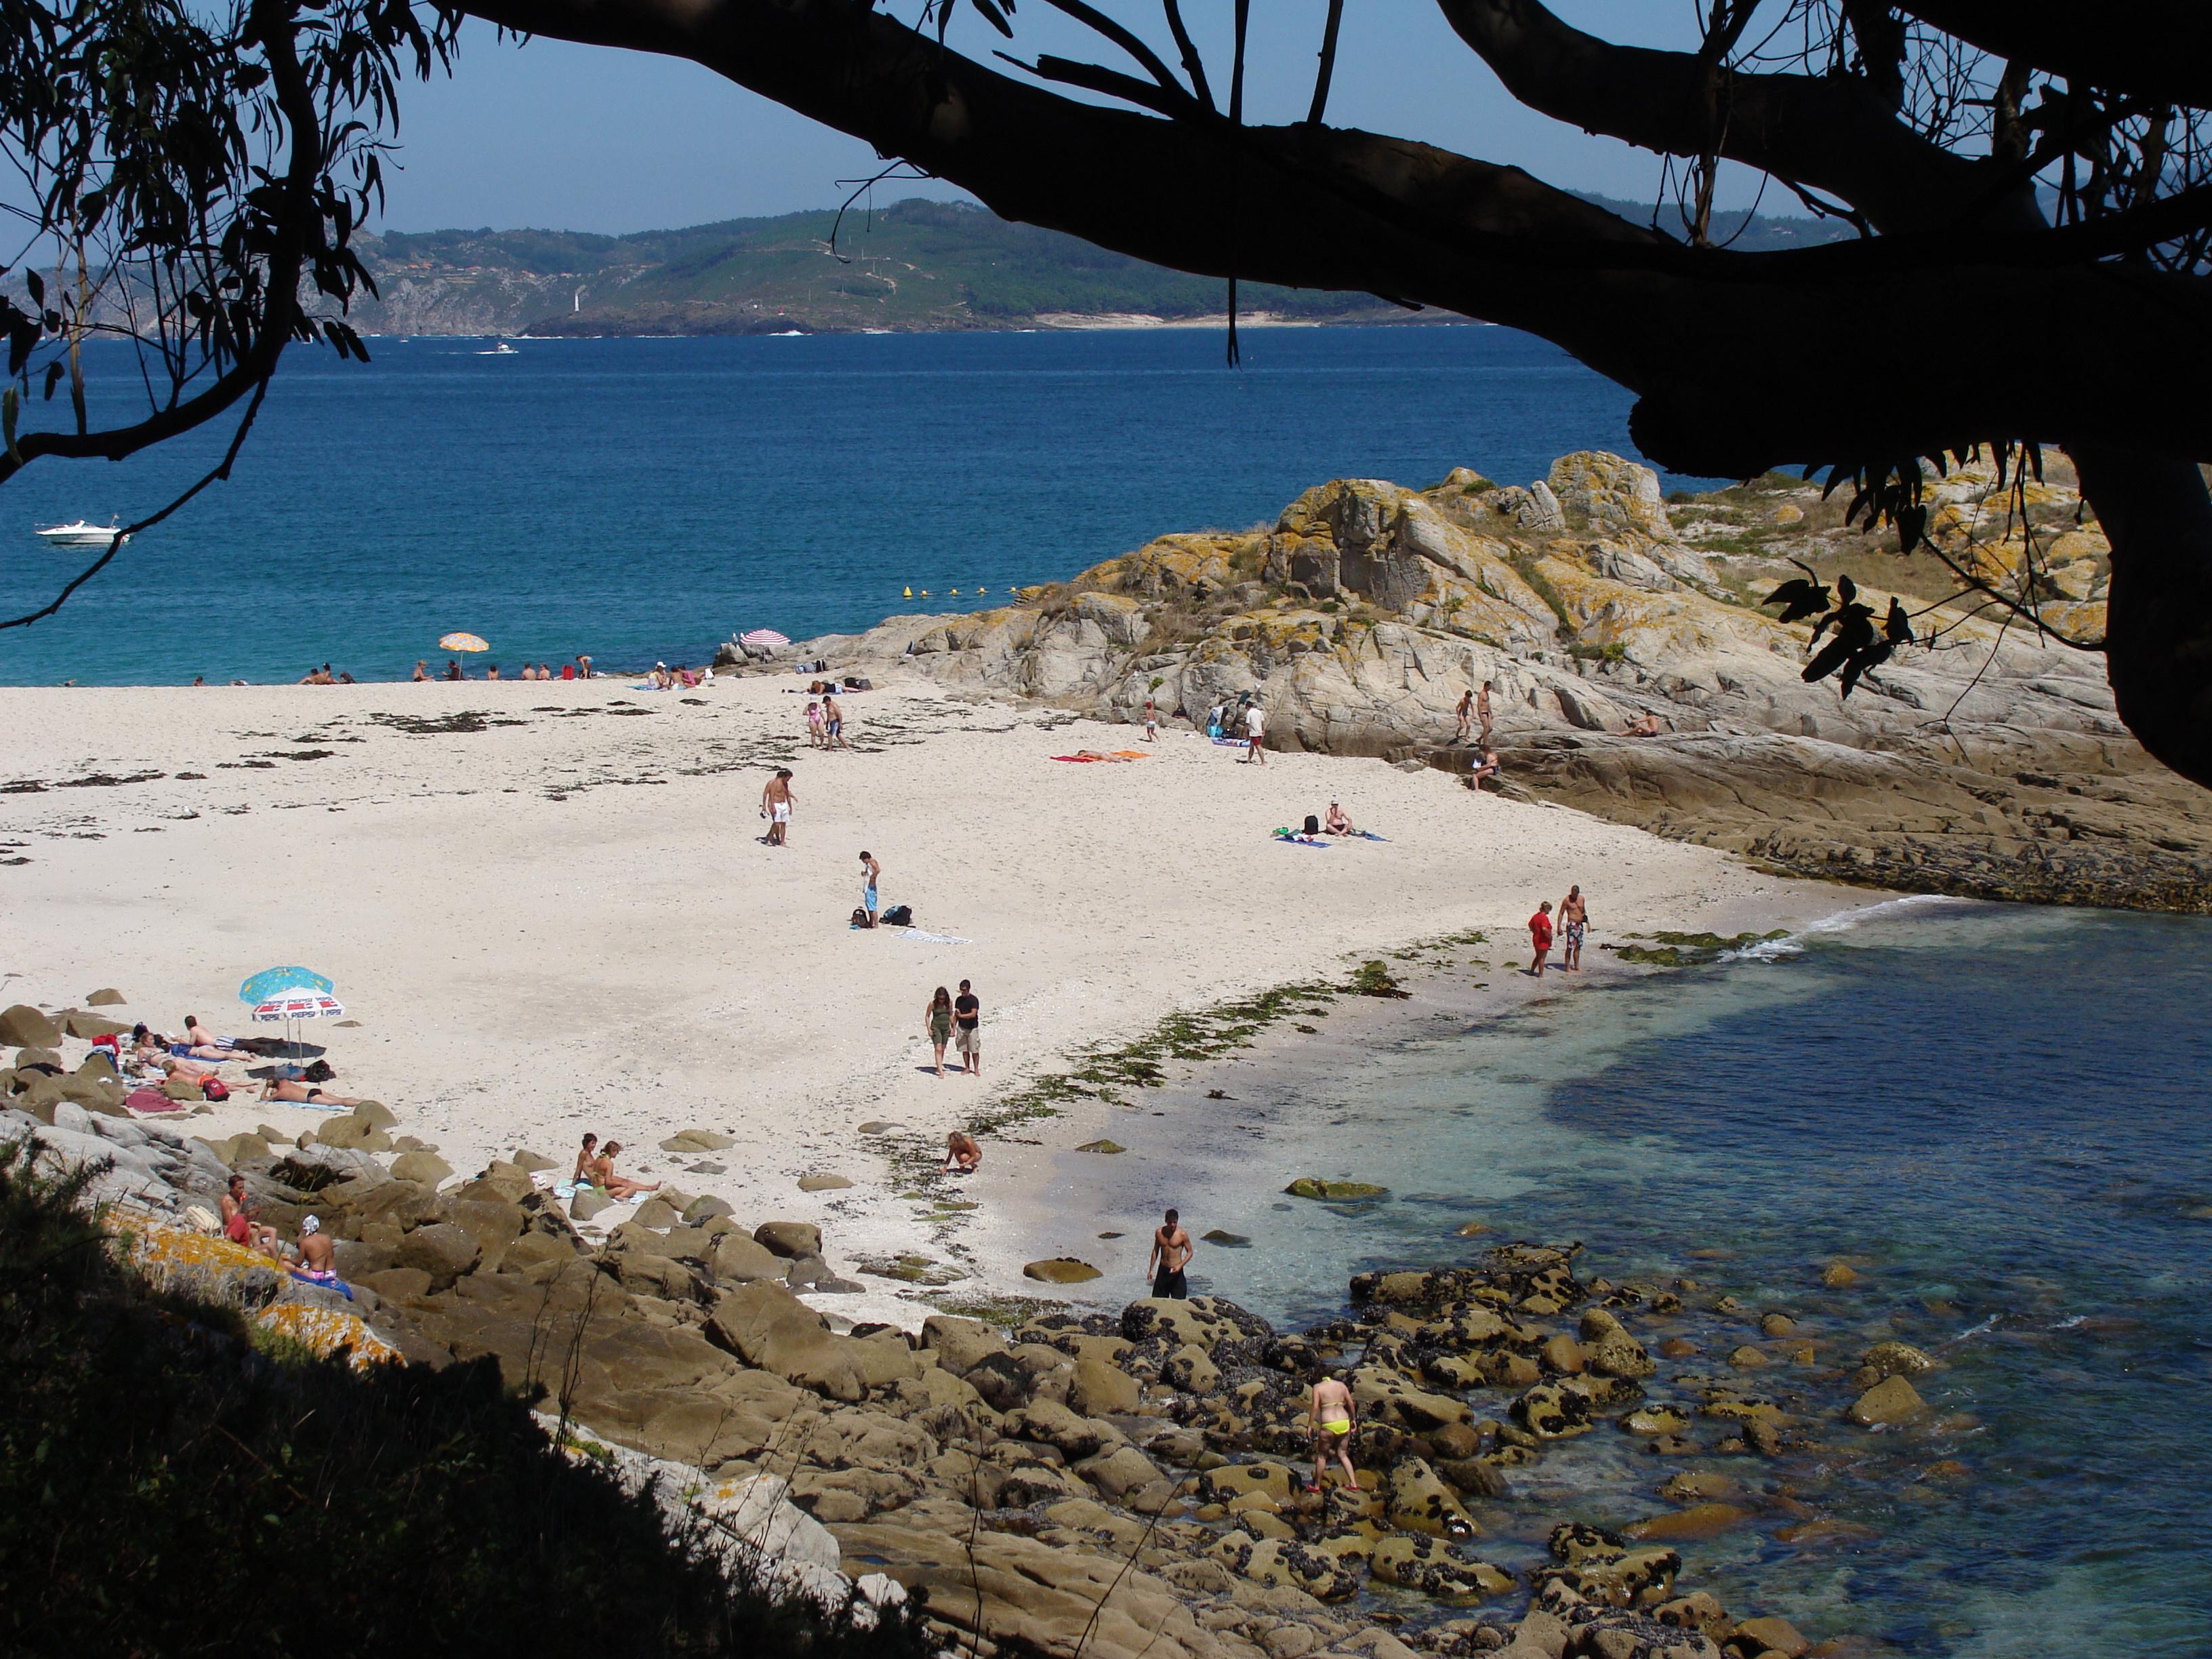 File:Praia dos viños.002 - Islas Cies.JPG - Wikimedia Commons